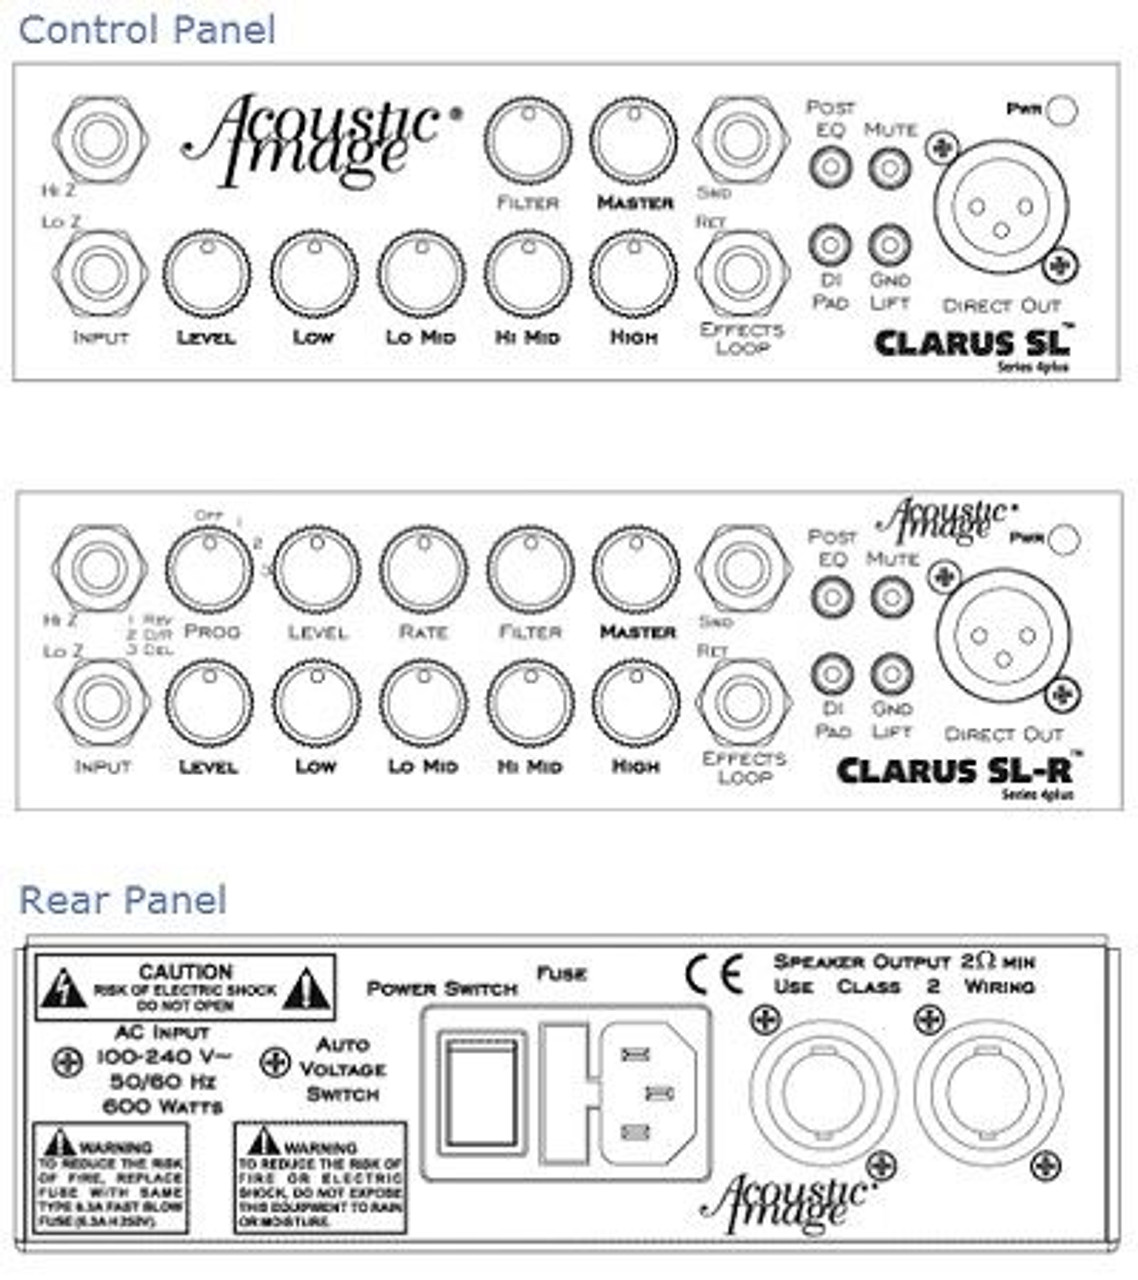 CLARUS SL and SL-R instrument amplifier